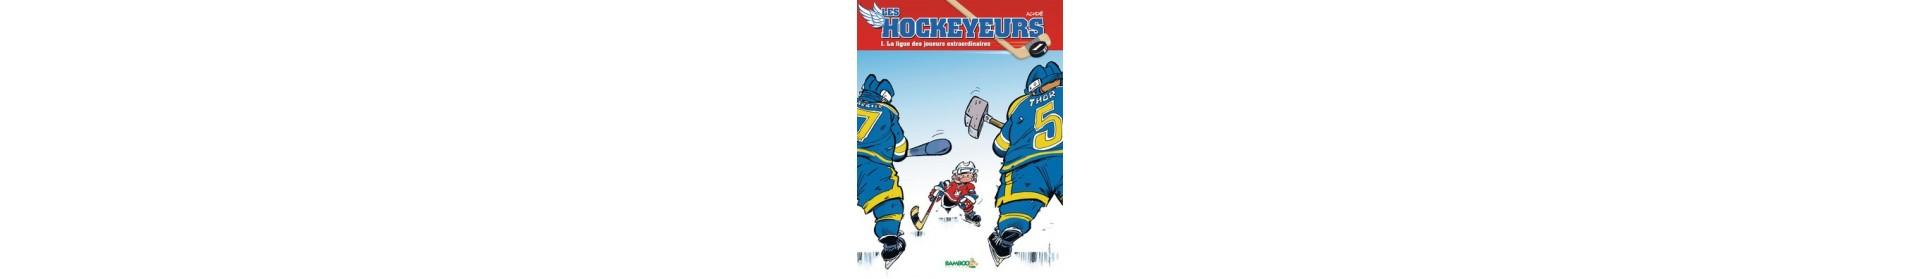 Gadegets NHL - Le Vestiaire